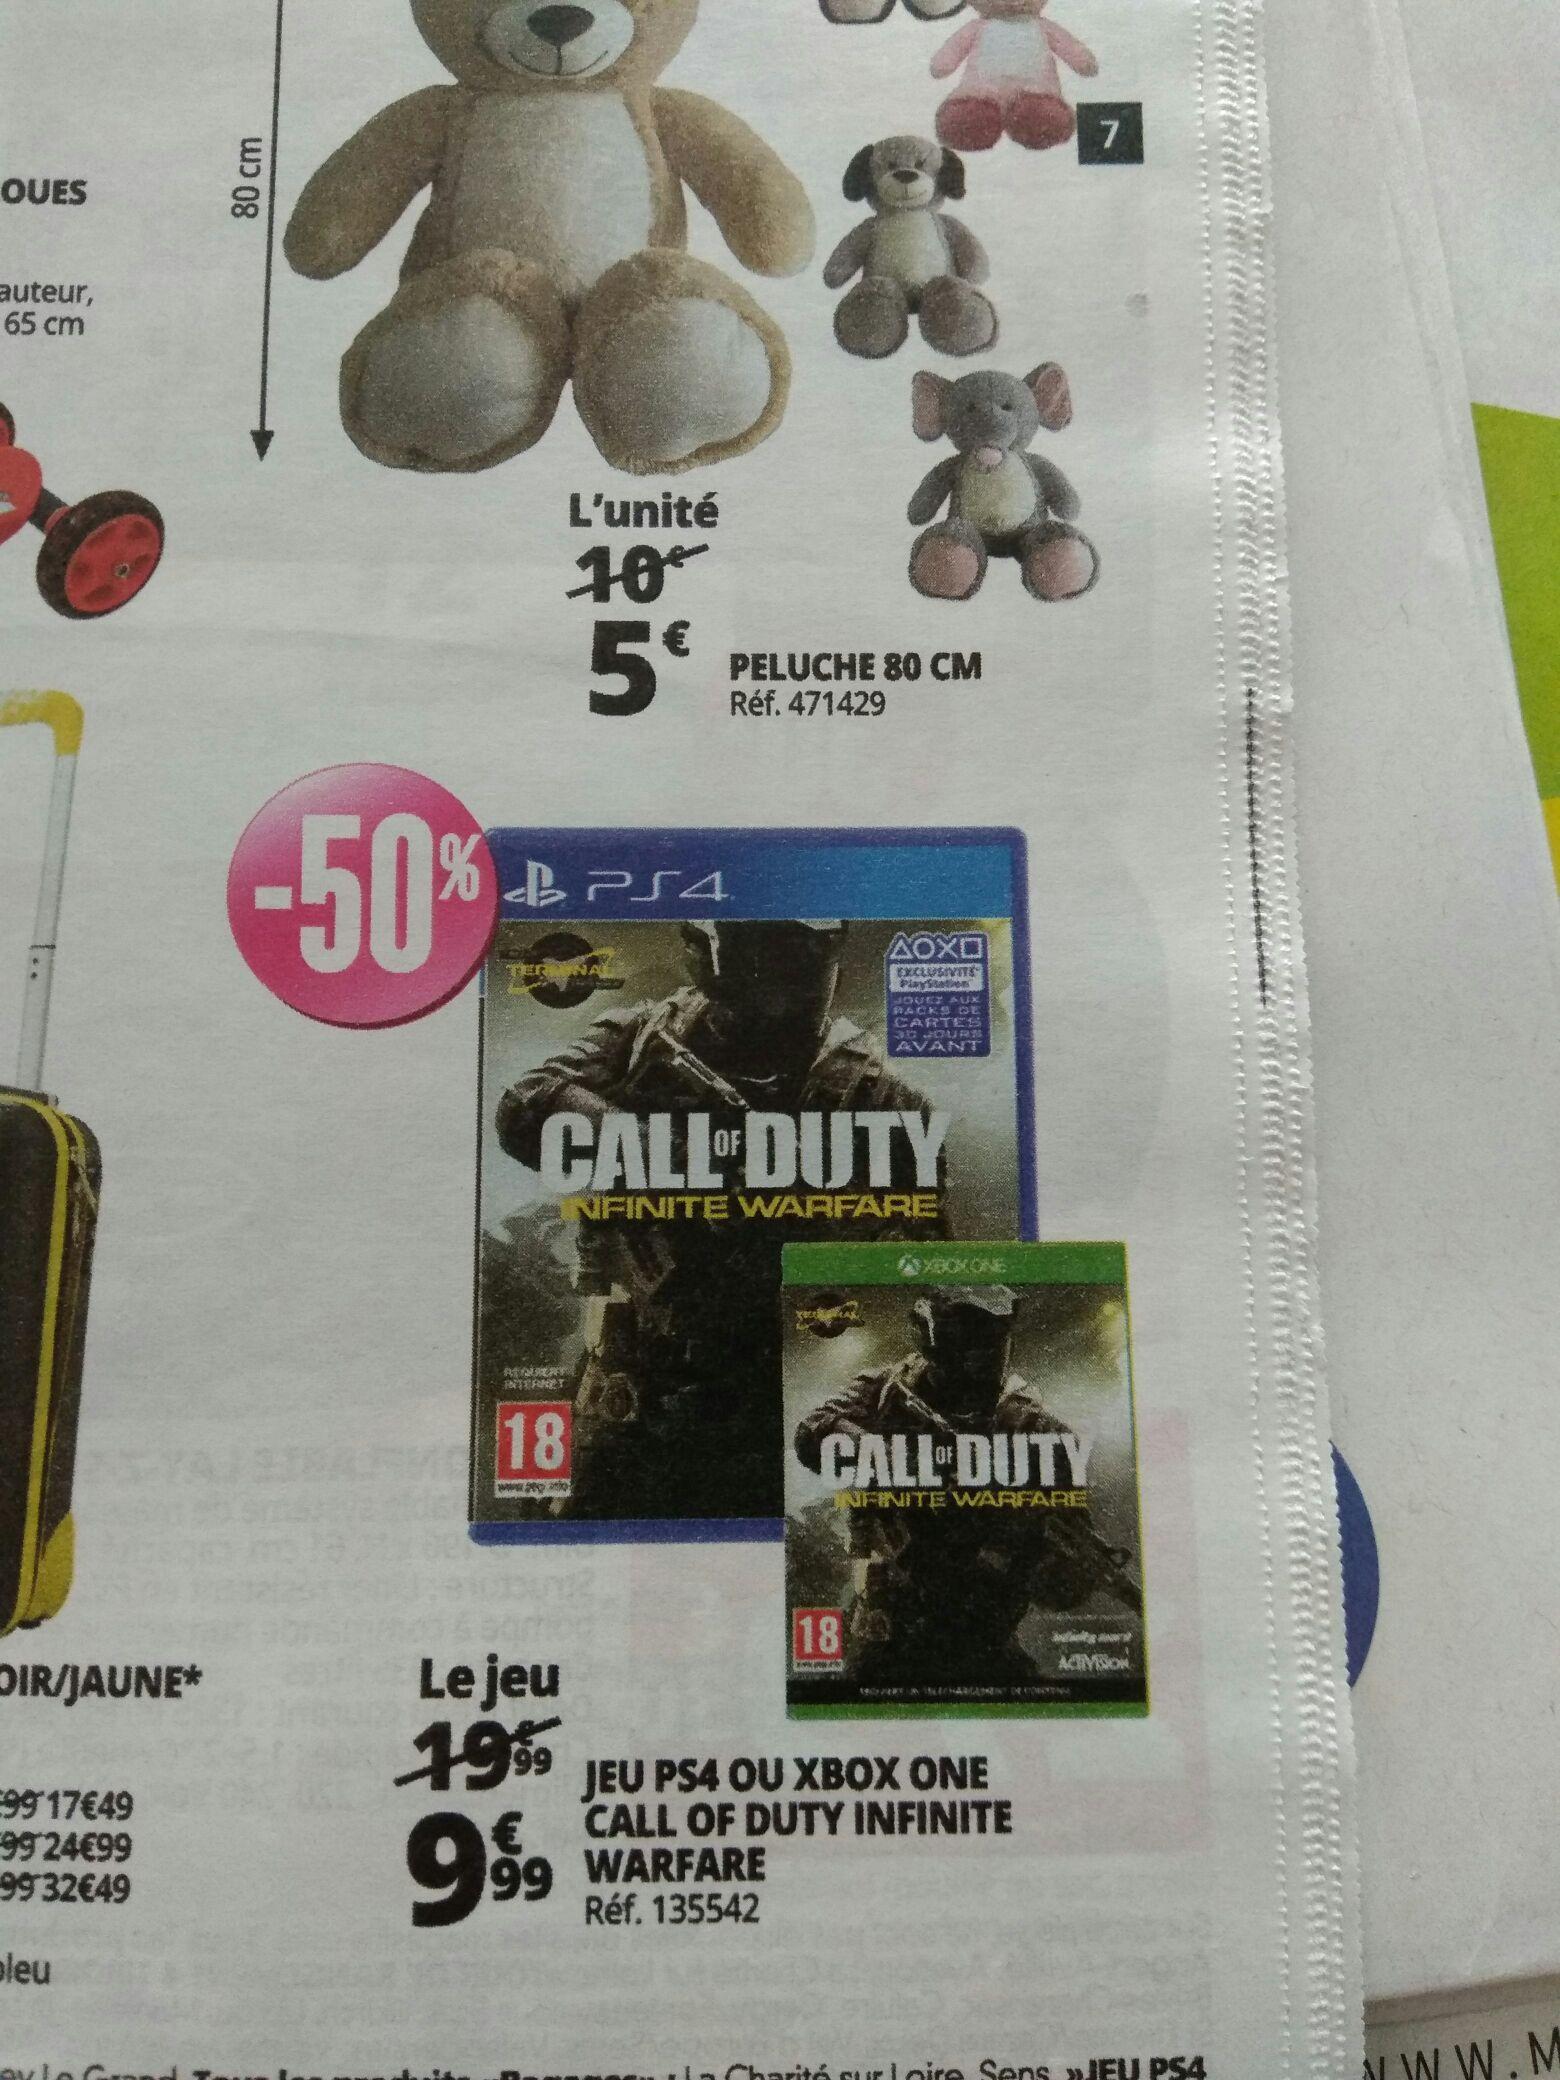 Jeu Call of duty : Infinite warfare sur PS4 ou Xbox One